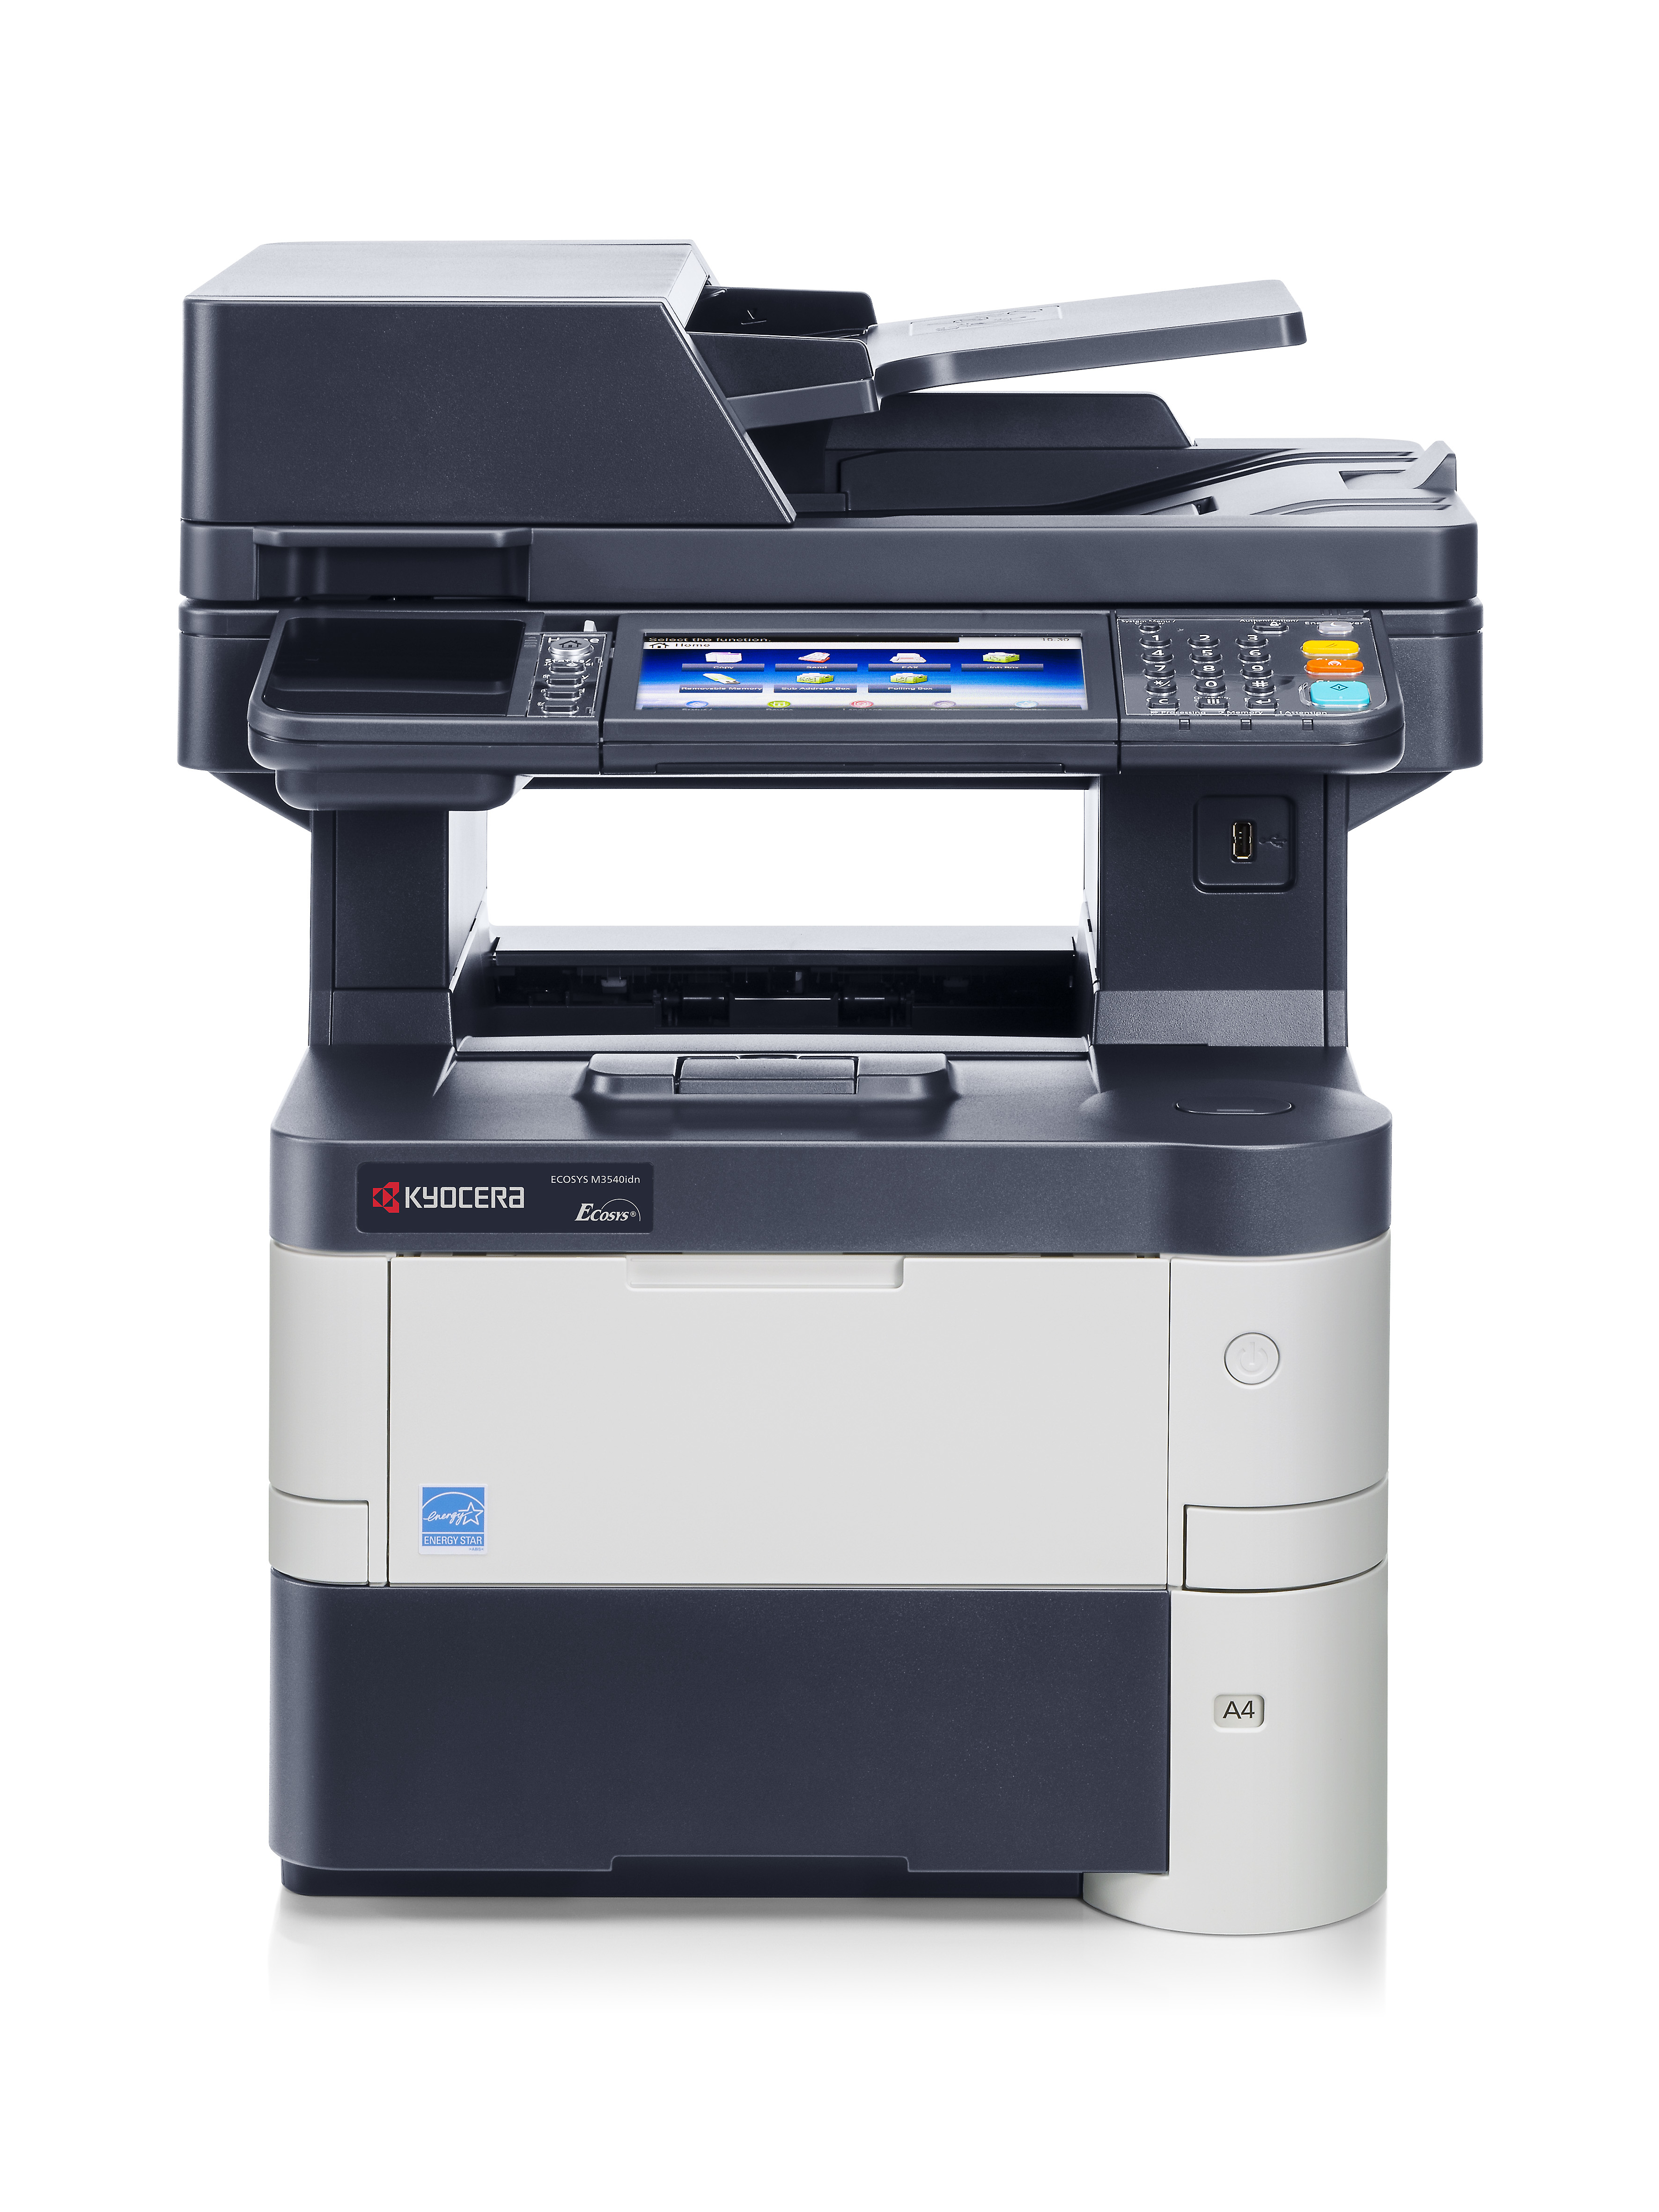 KYOCERA ECOSYS M3540idn mono Laserdrucker 40ppm print scan copy fax